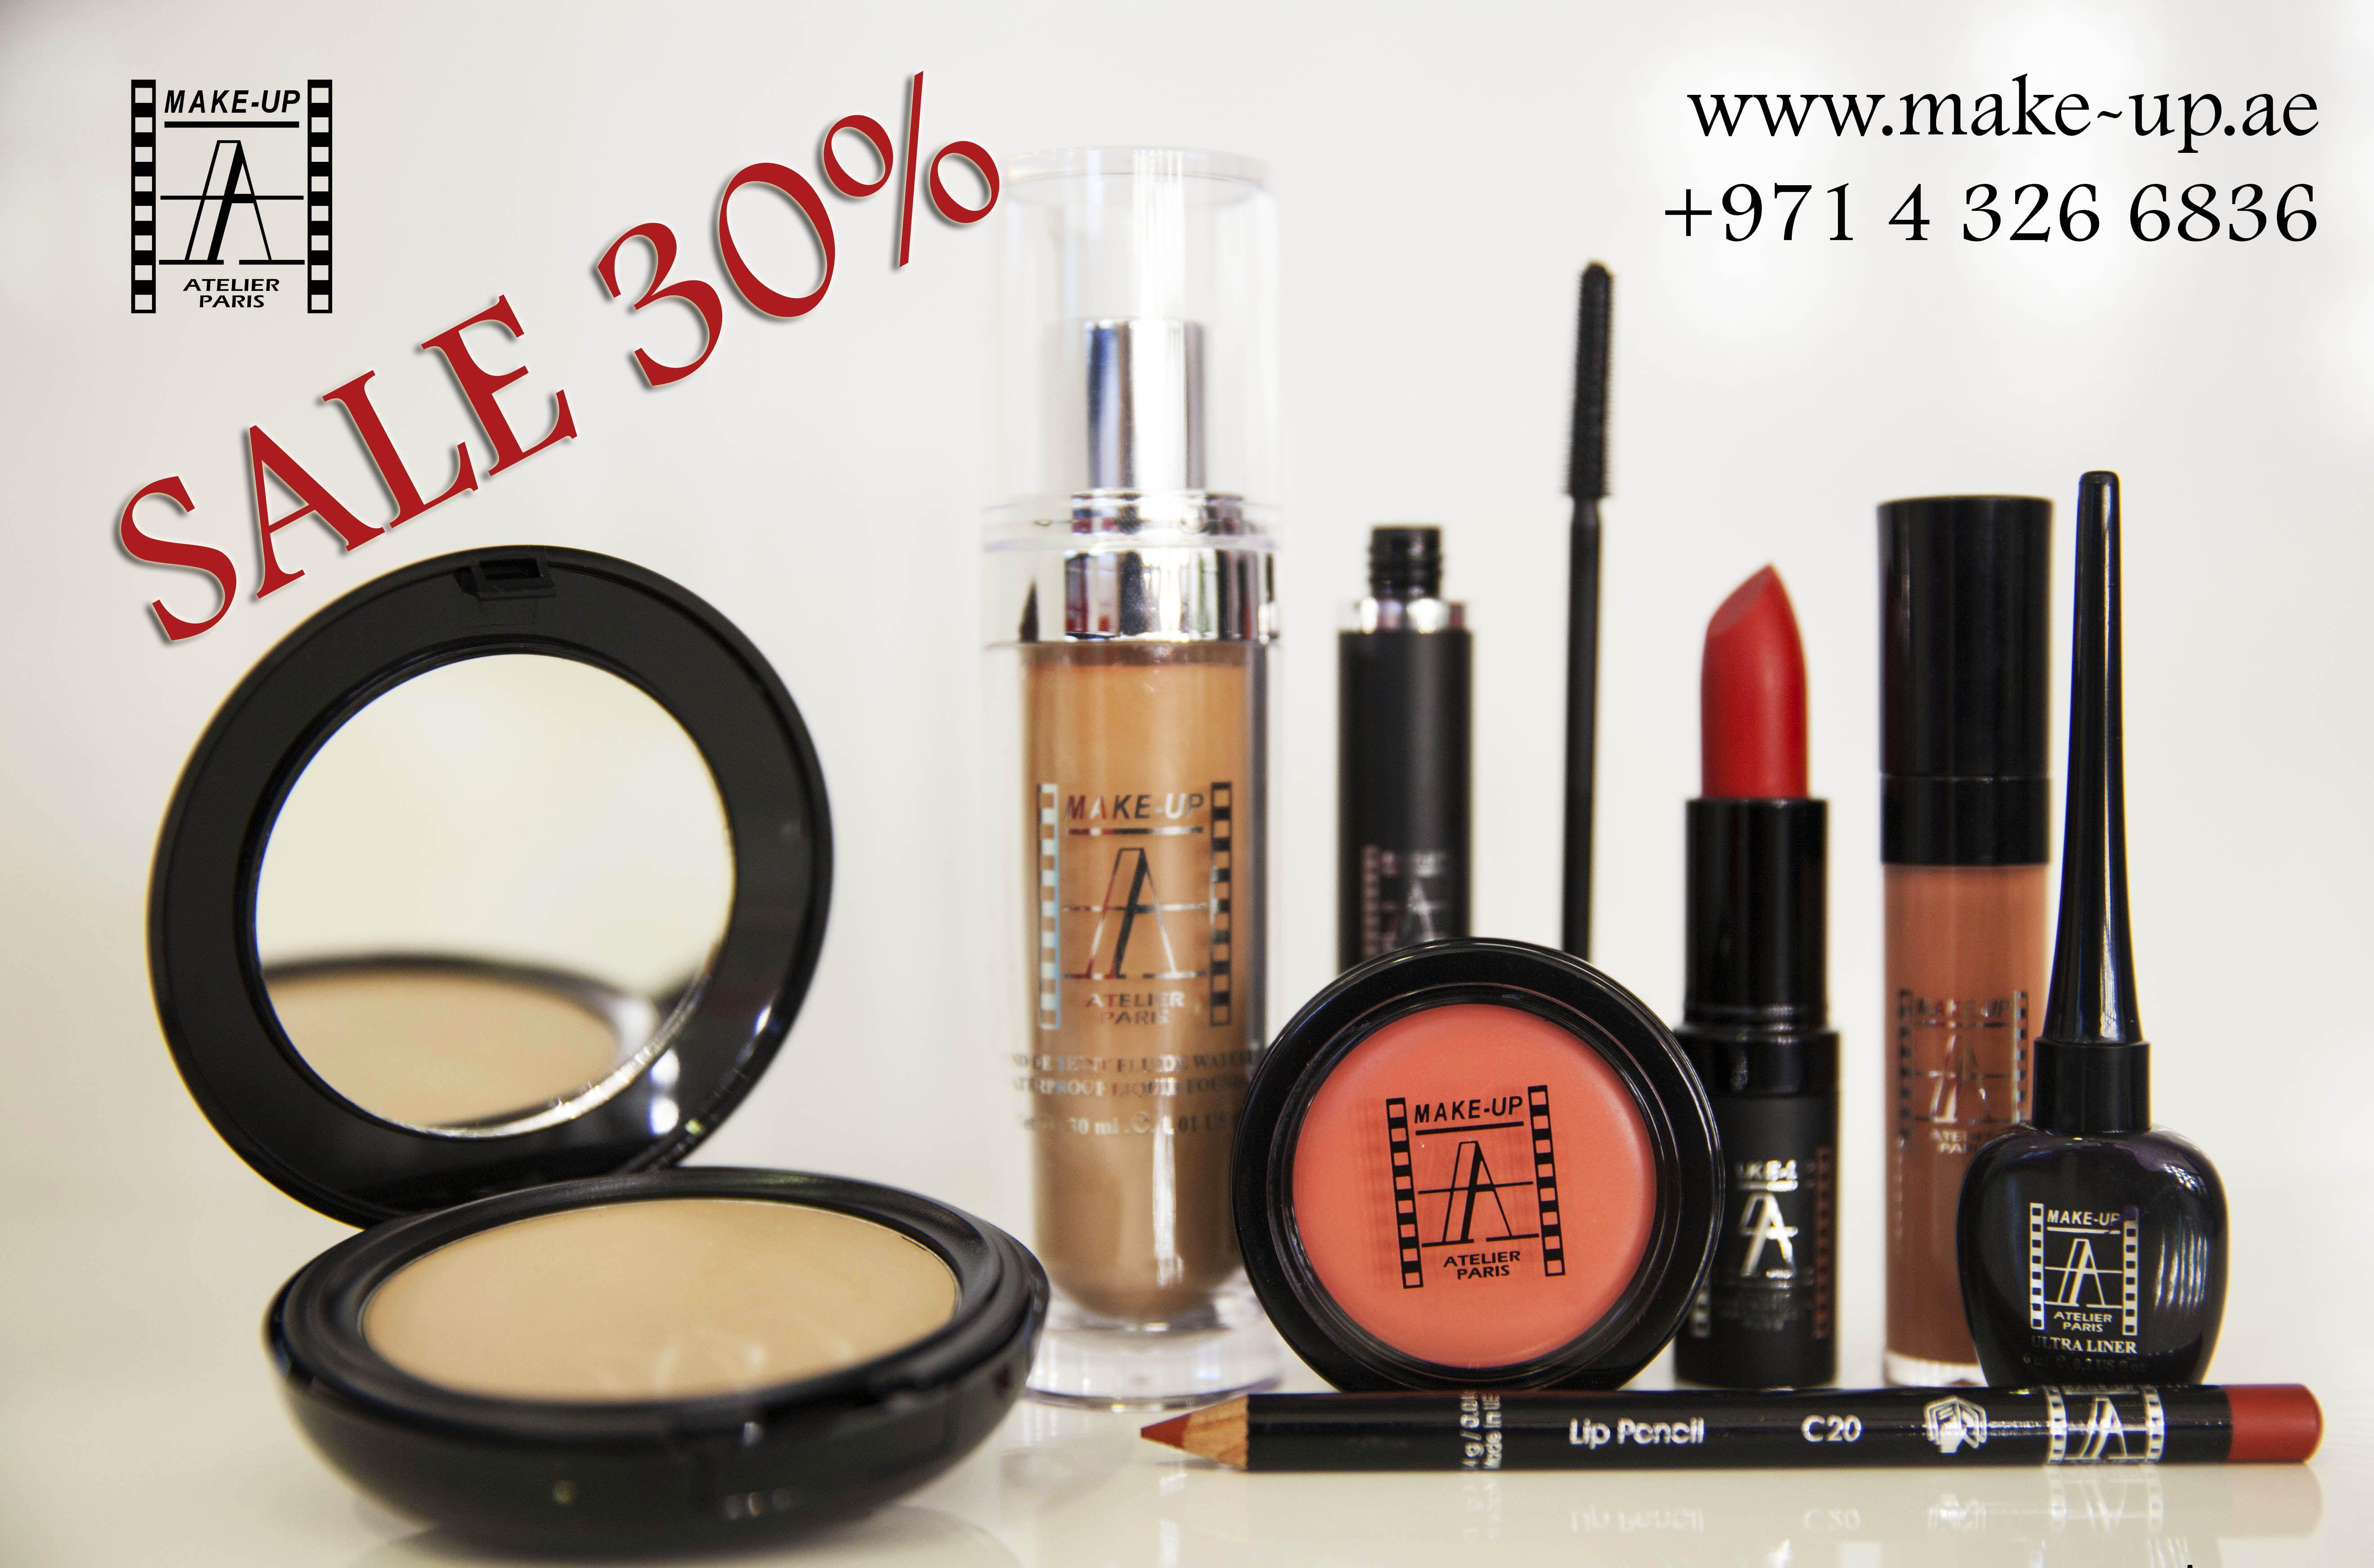 Makeup Atelier Dubai Cosmetics Have you ever heard of a